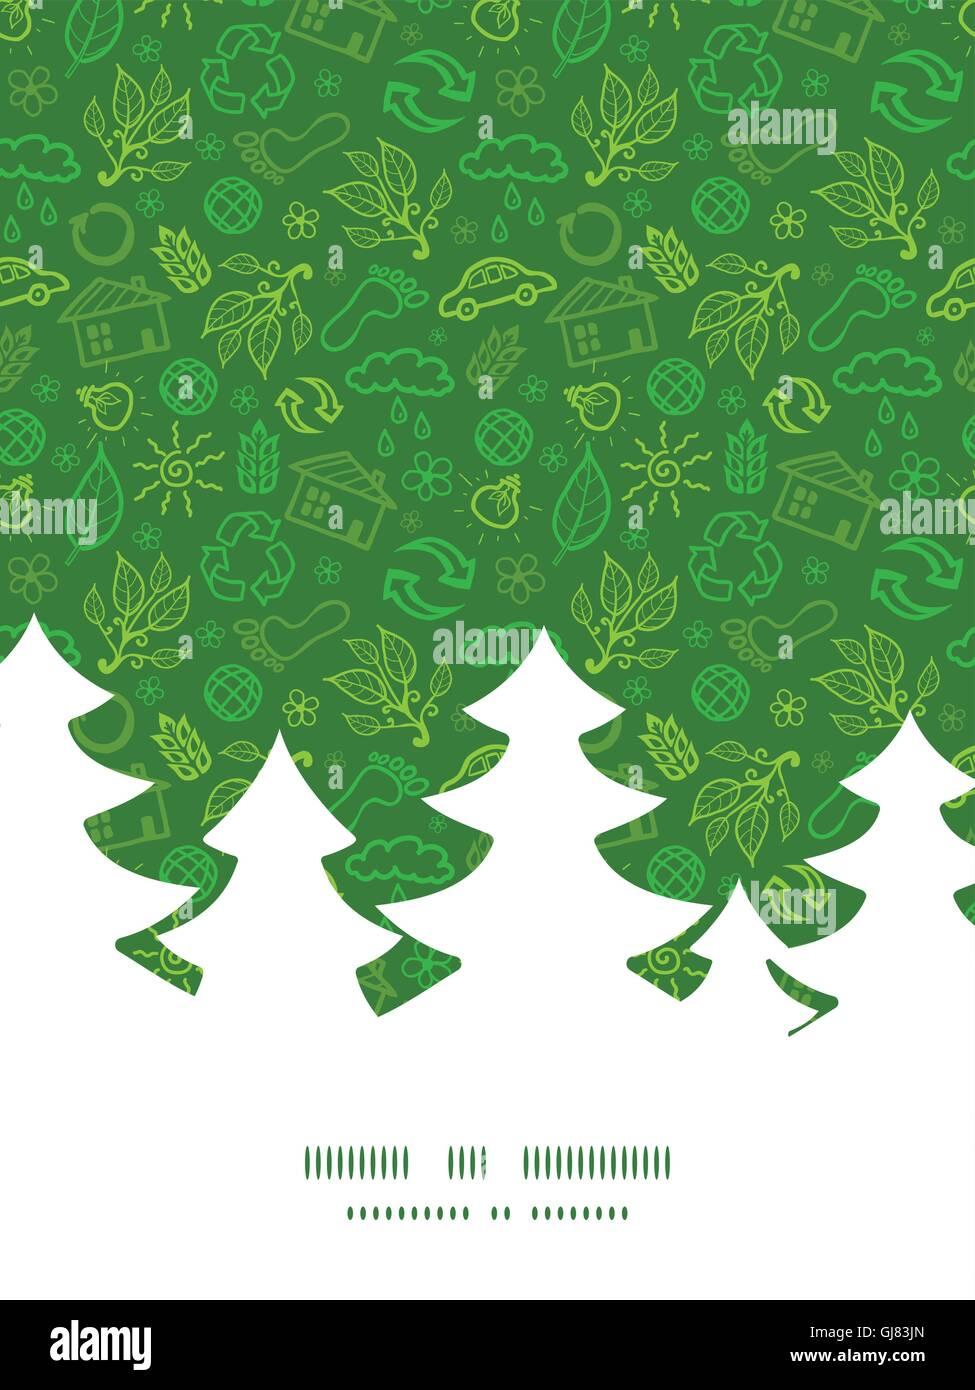 Recycled Water Tree Stockfotos & Recycled Water Tree Bilder - Alamy